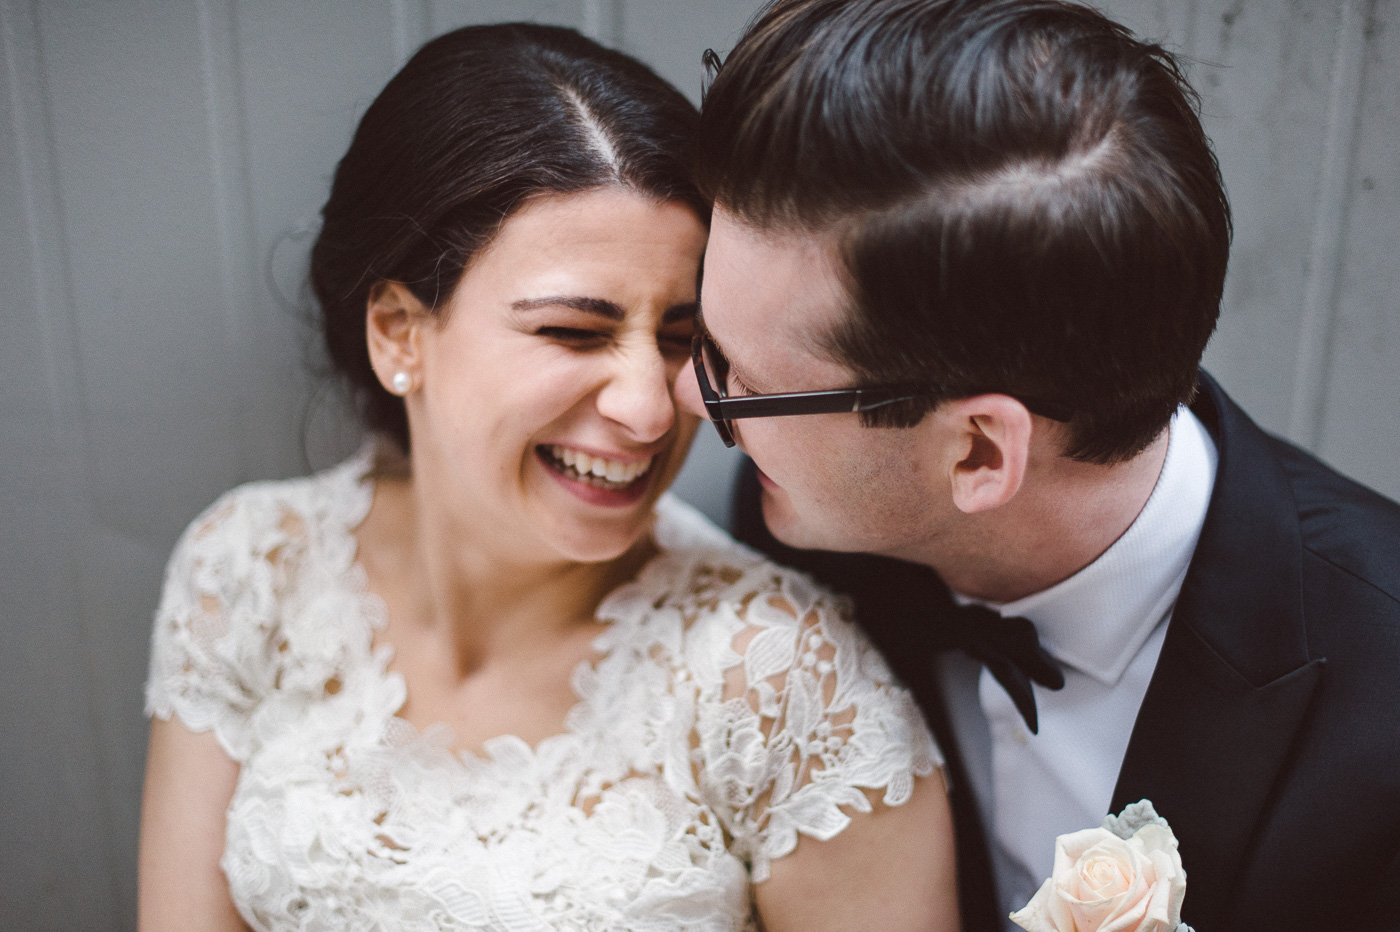 Melbourne-lane-wedding-photo